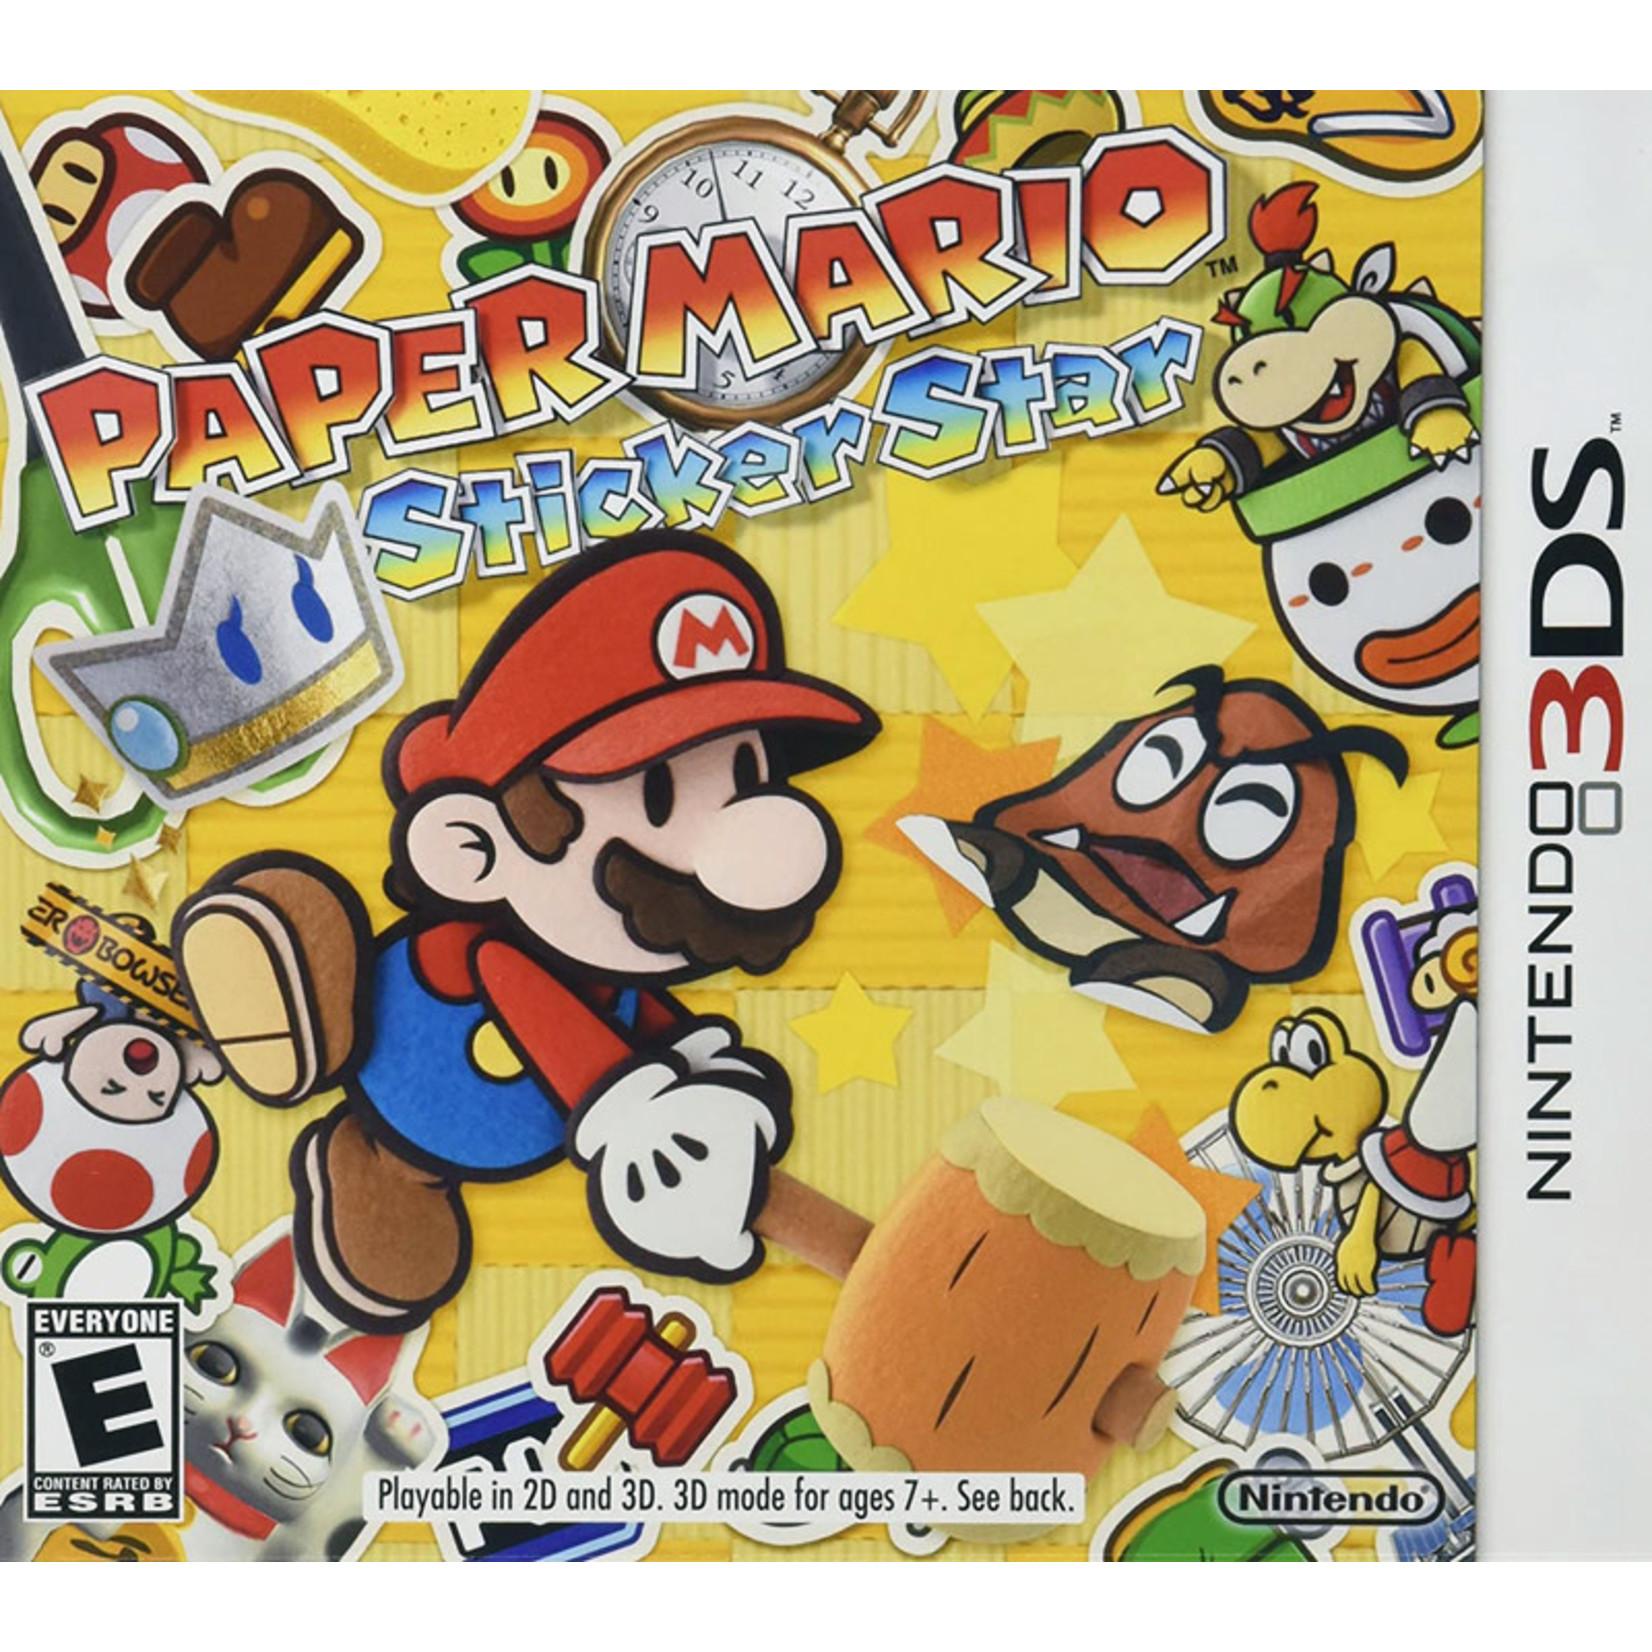 3DSU-Paper Mario: Sticker Star